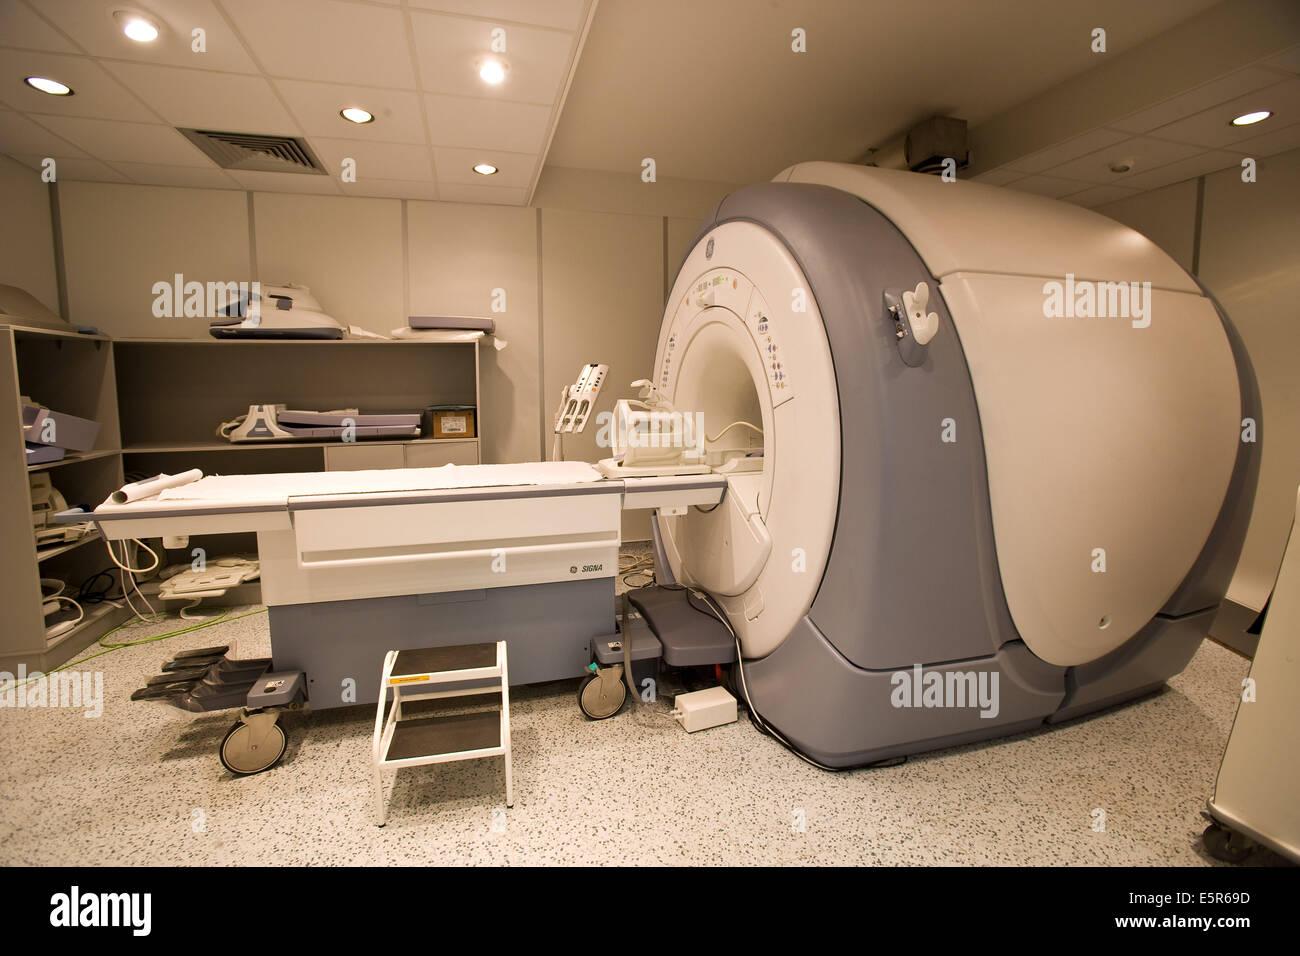 Closed geometry Magnetic Resonance Imaging (MRI) unit, 3 tesla. - Stock Image